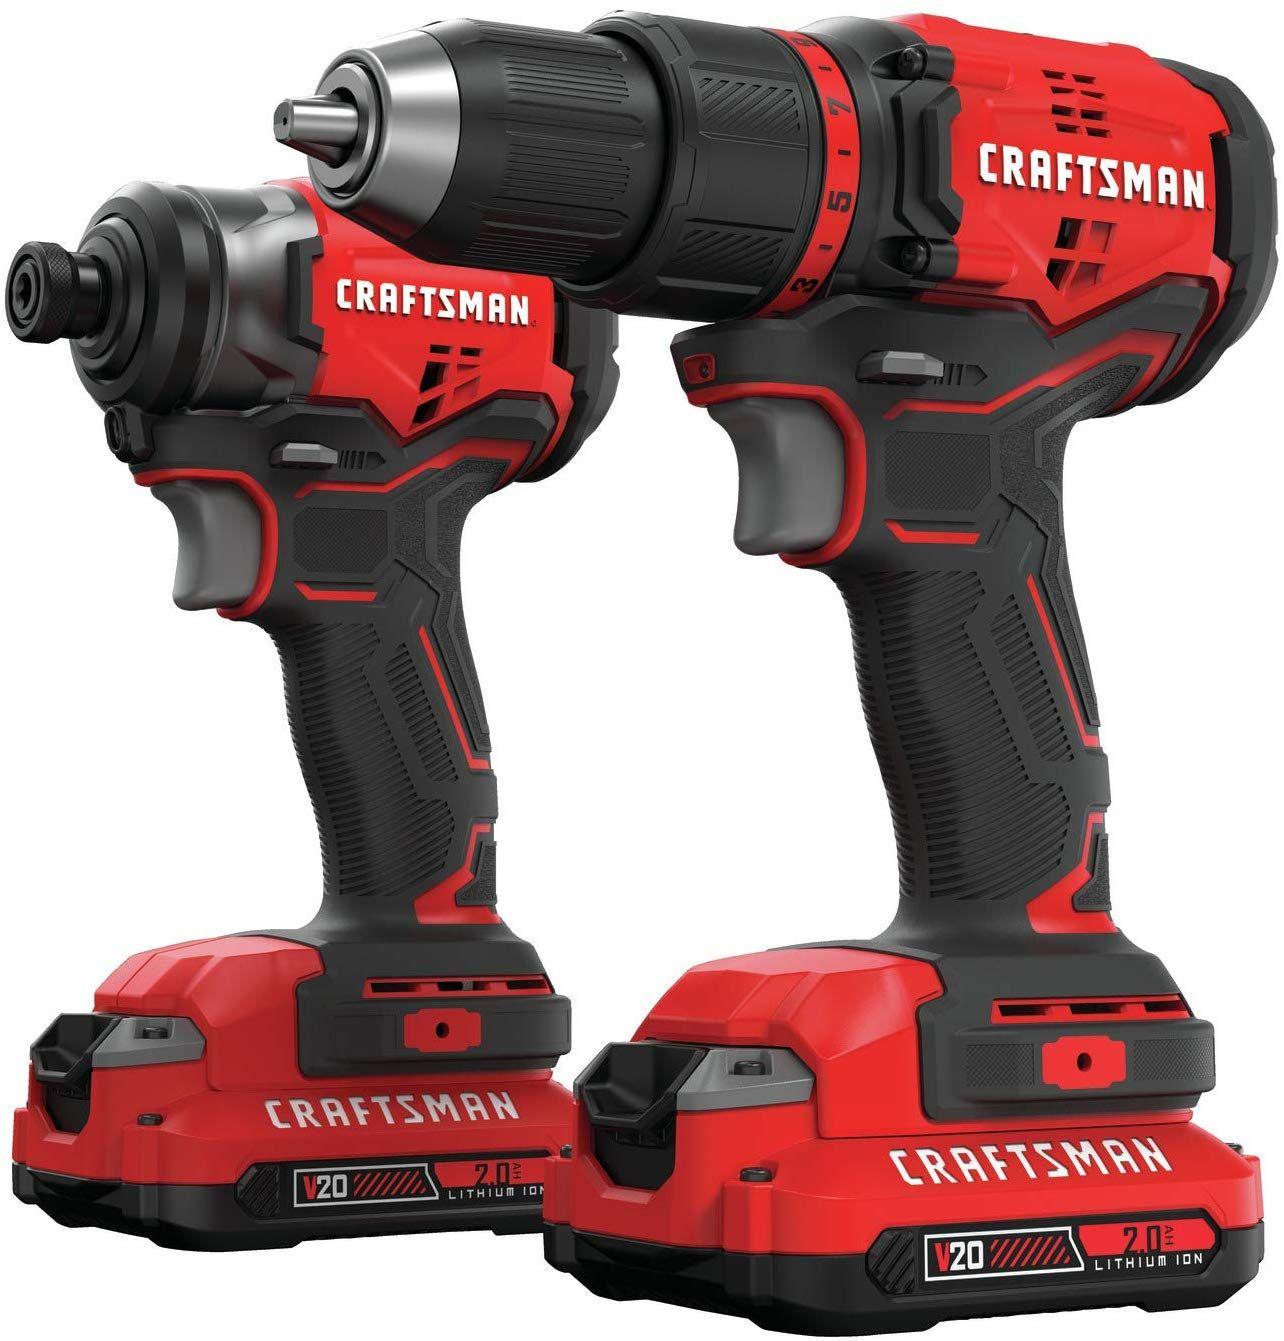 Craftsman V20 Cordless Drill Combo Kit 2 Tool Cmck210c2 Drill Cordless Drill Cordless Drill Reviews